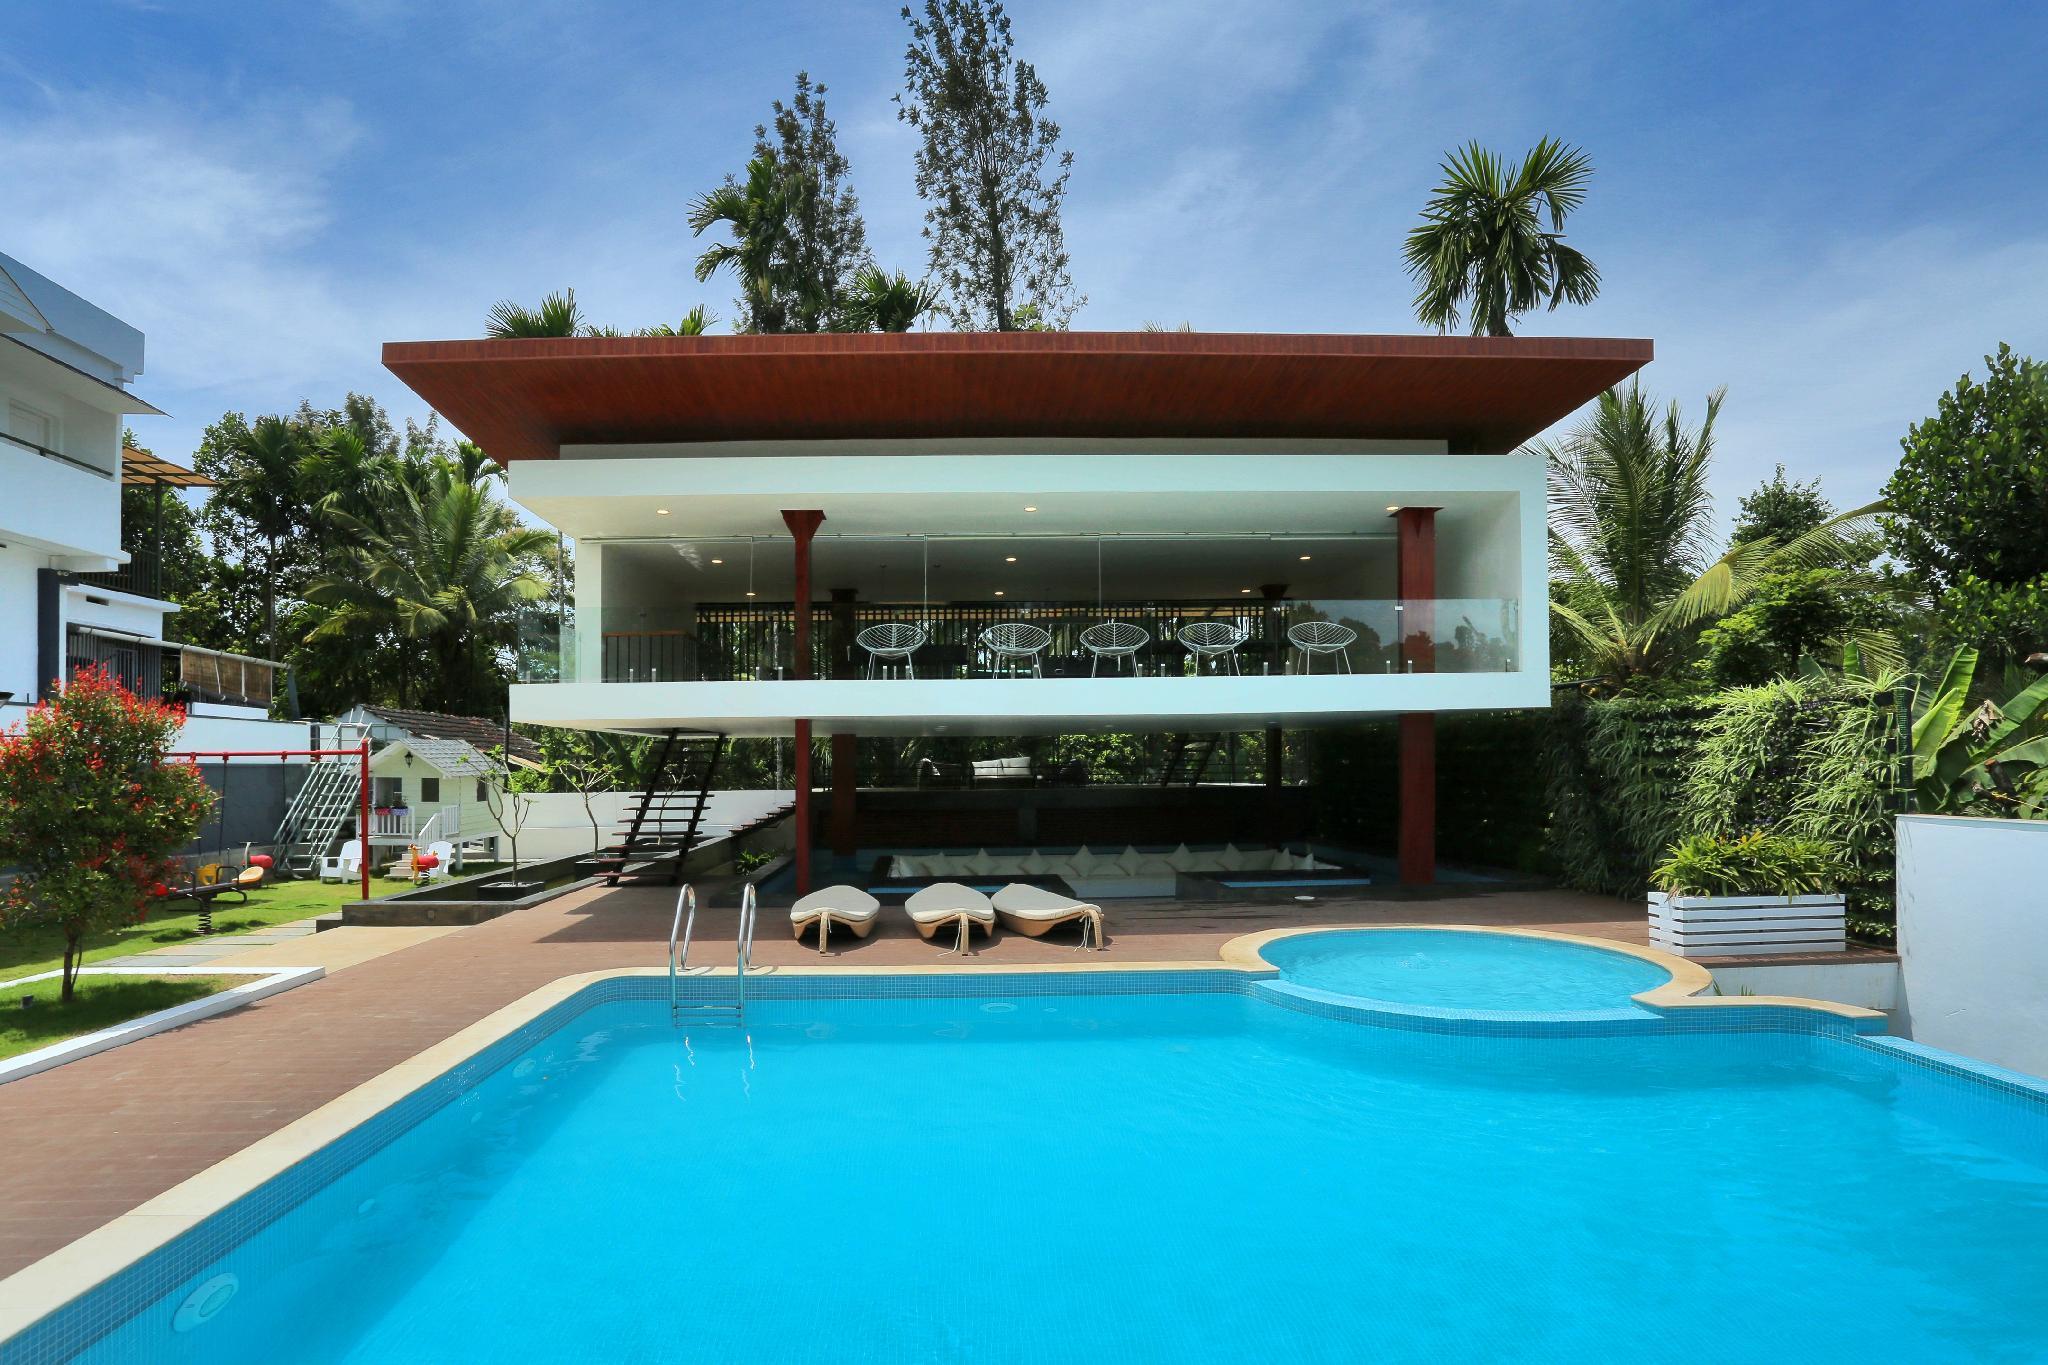 Le Villagio Holiday Apartment Vacation Rentals In India